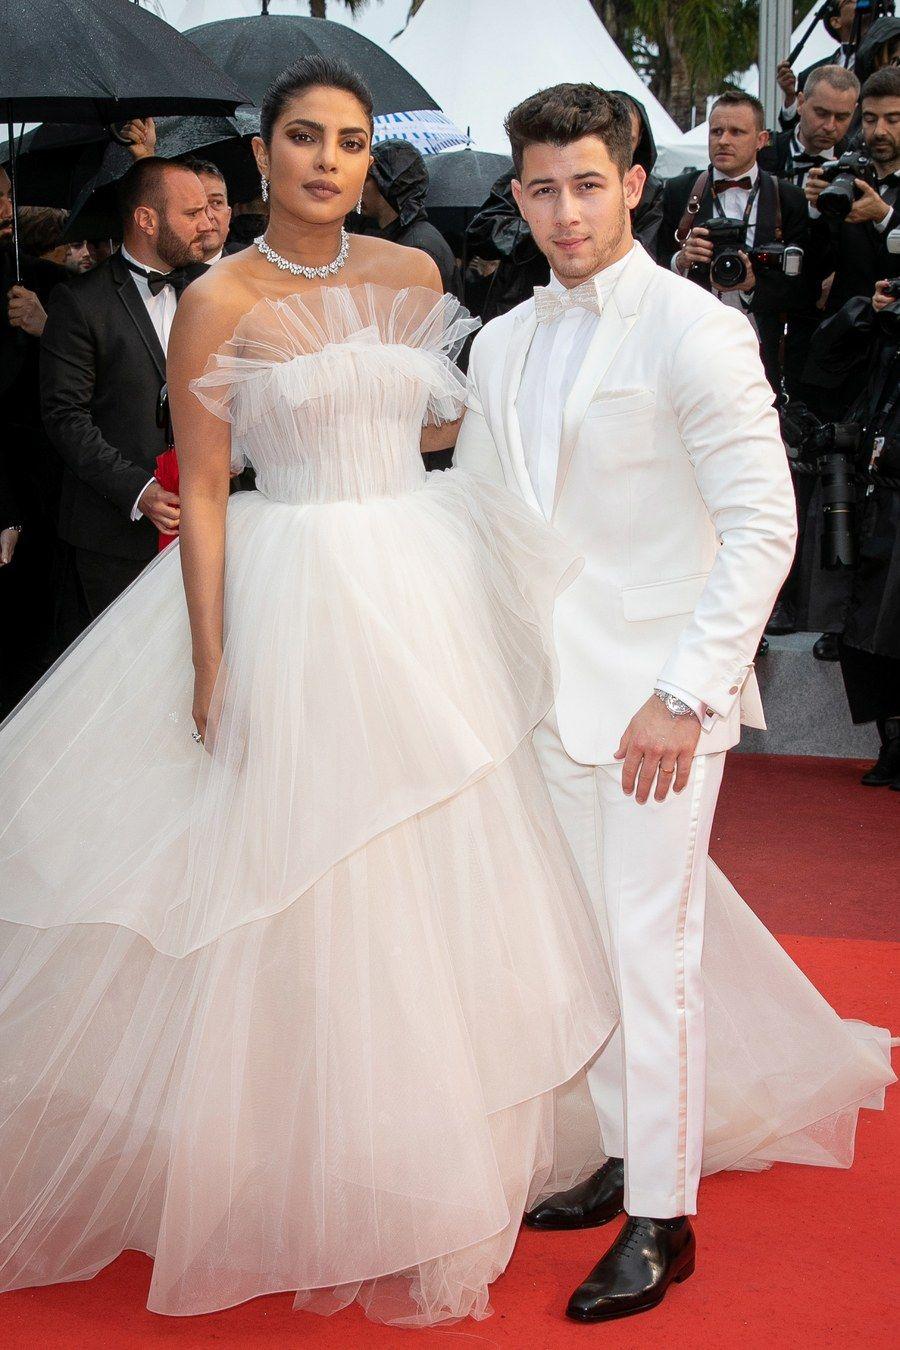 Cannes Film Festival 2016 Best Dressed Celebrities - Vogue